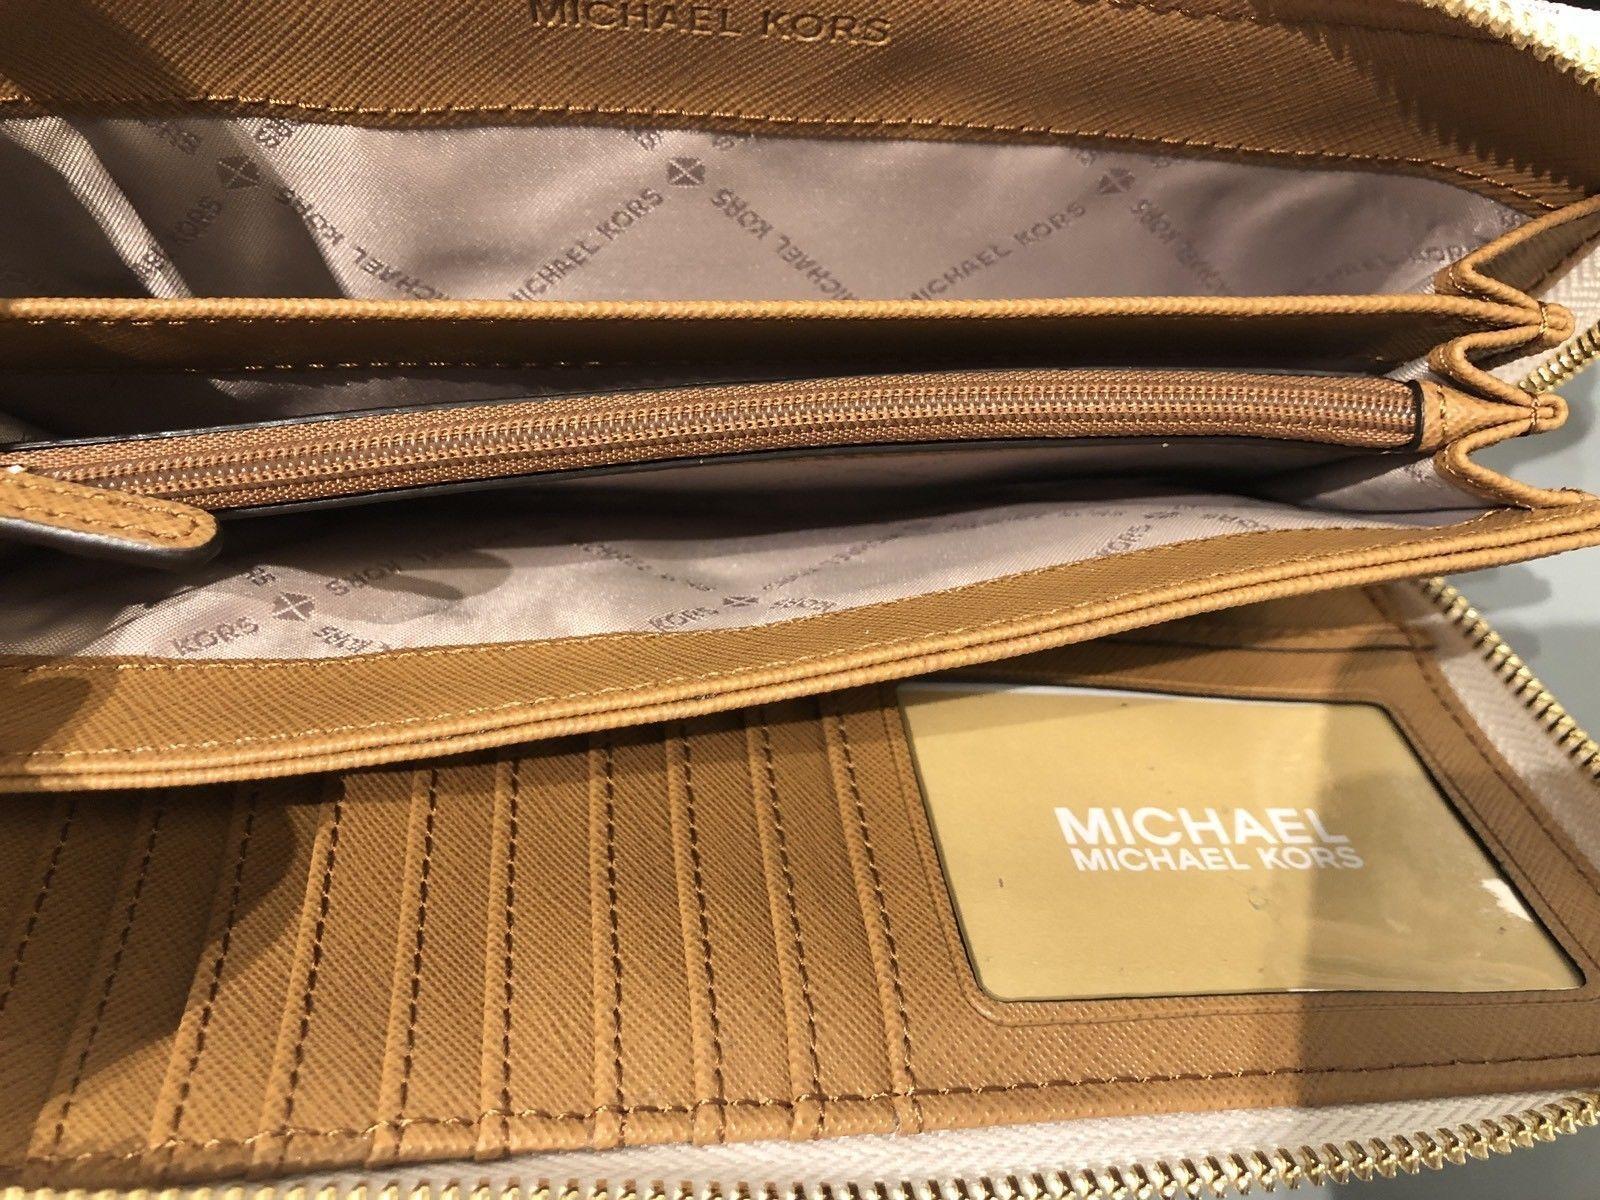 fd542c5098df7 T Michael Kors Mk Logo PVC Jet Set Viaggio Portafoglio Continental In